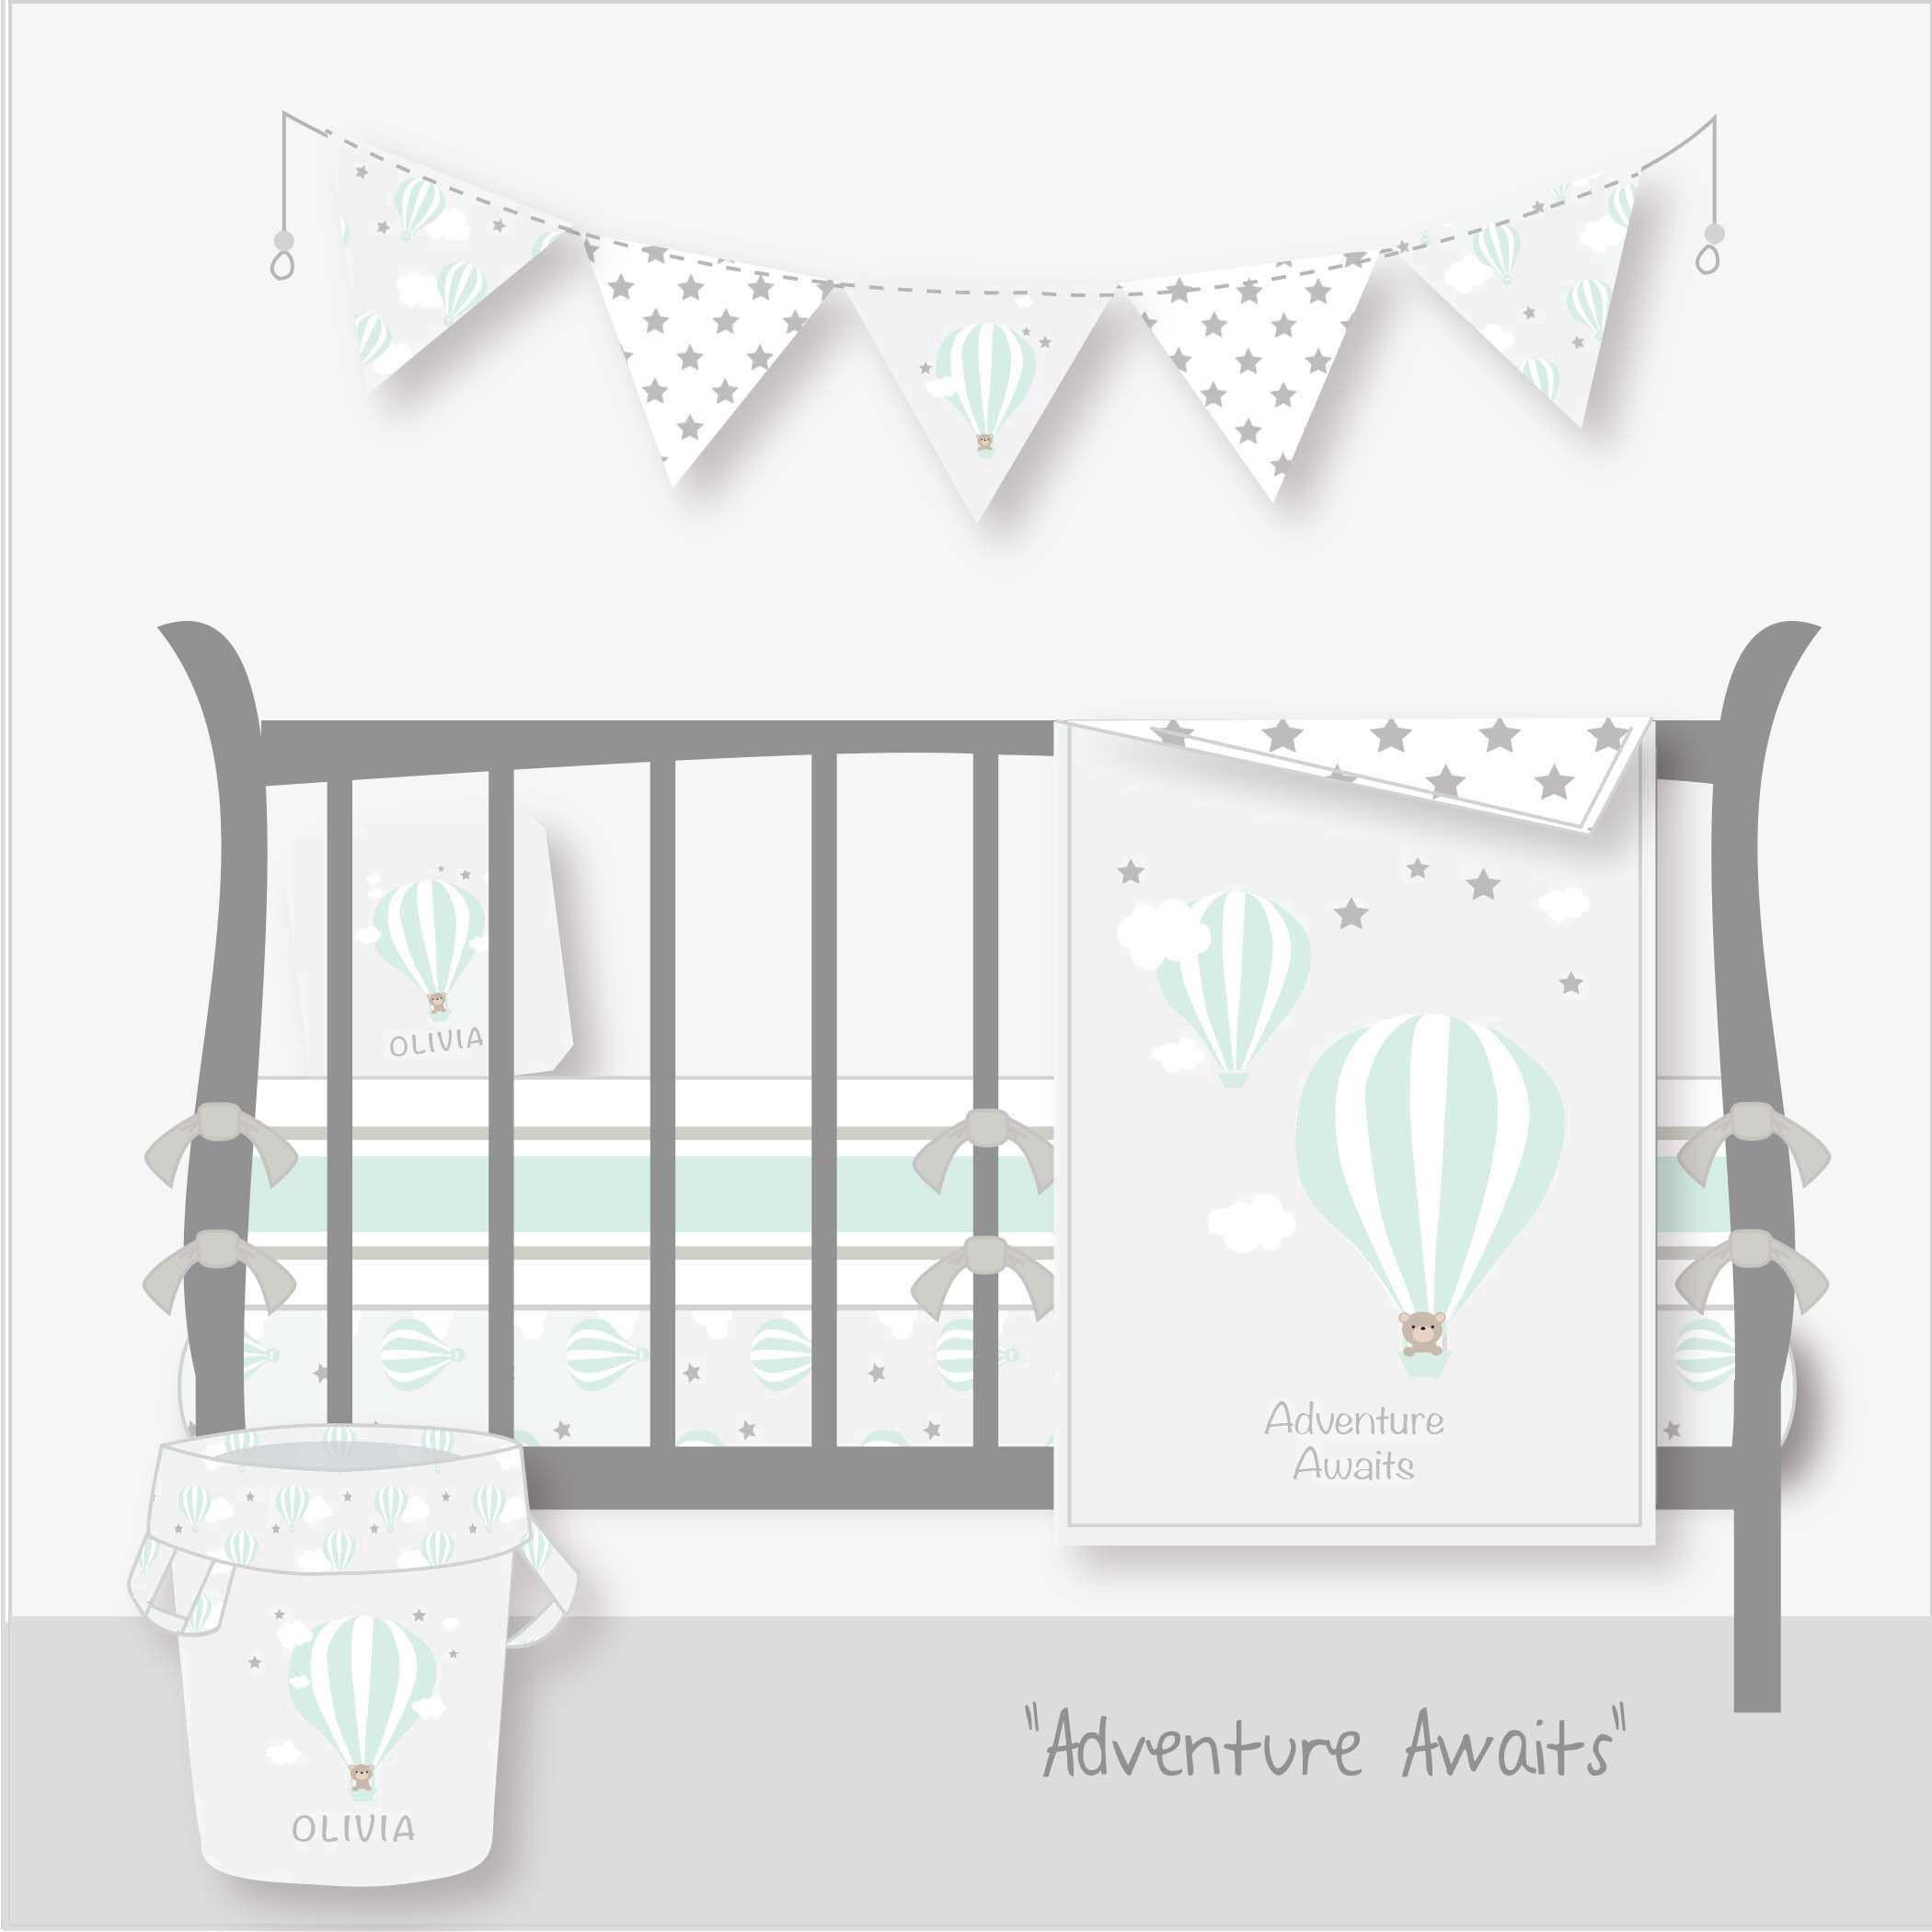 Hot Air Balloon Nursery BeddingPersonalized Nursery